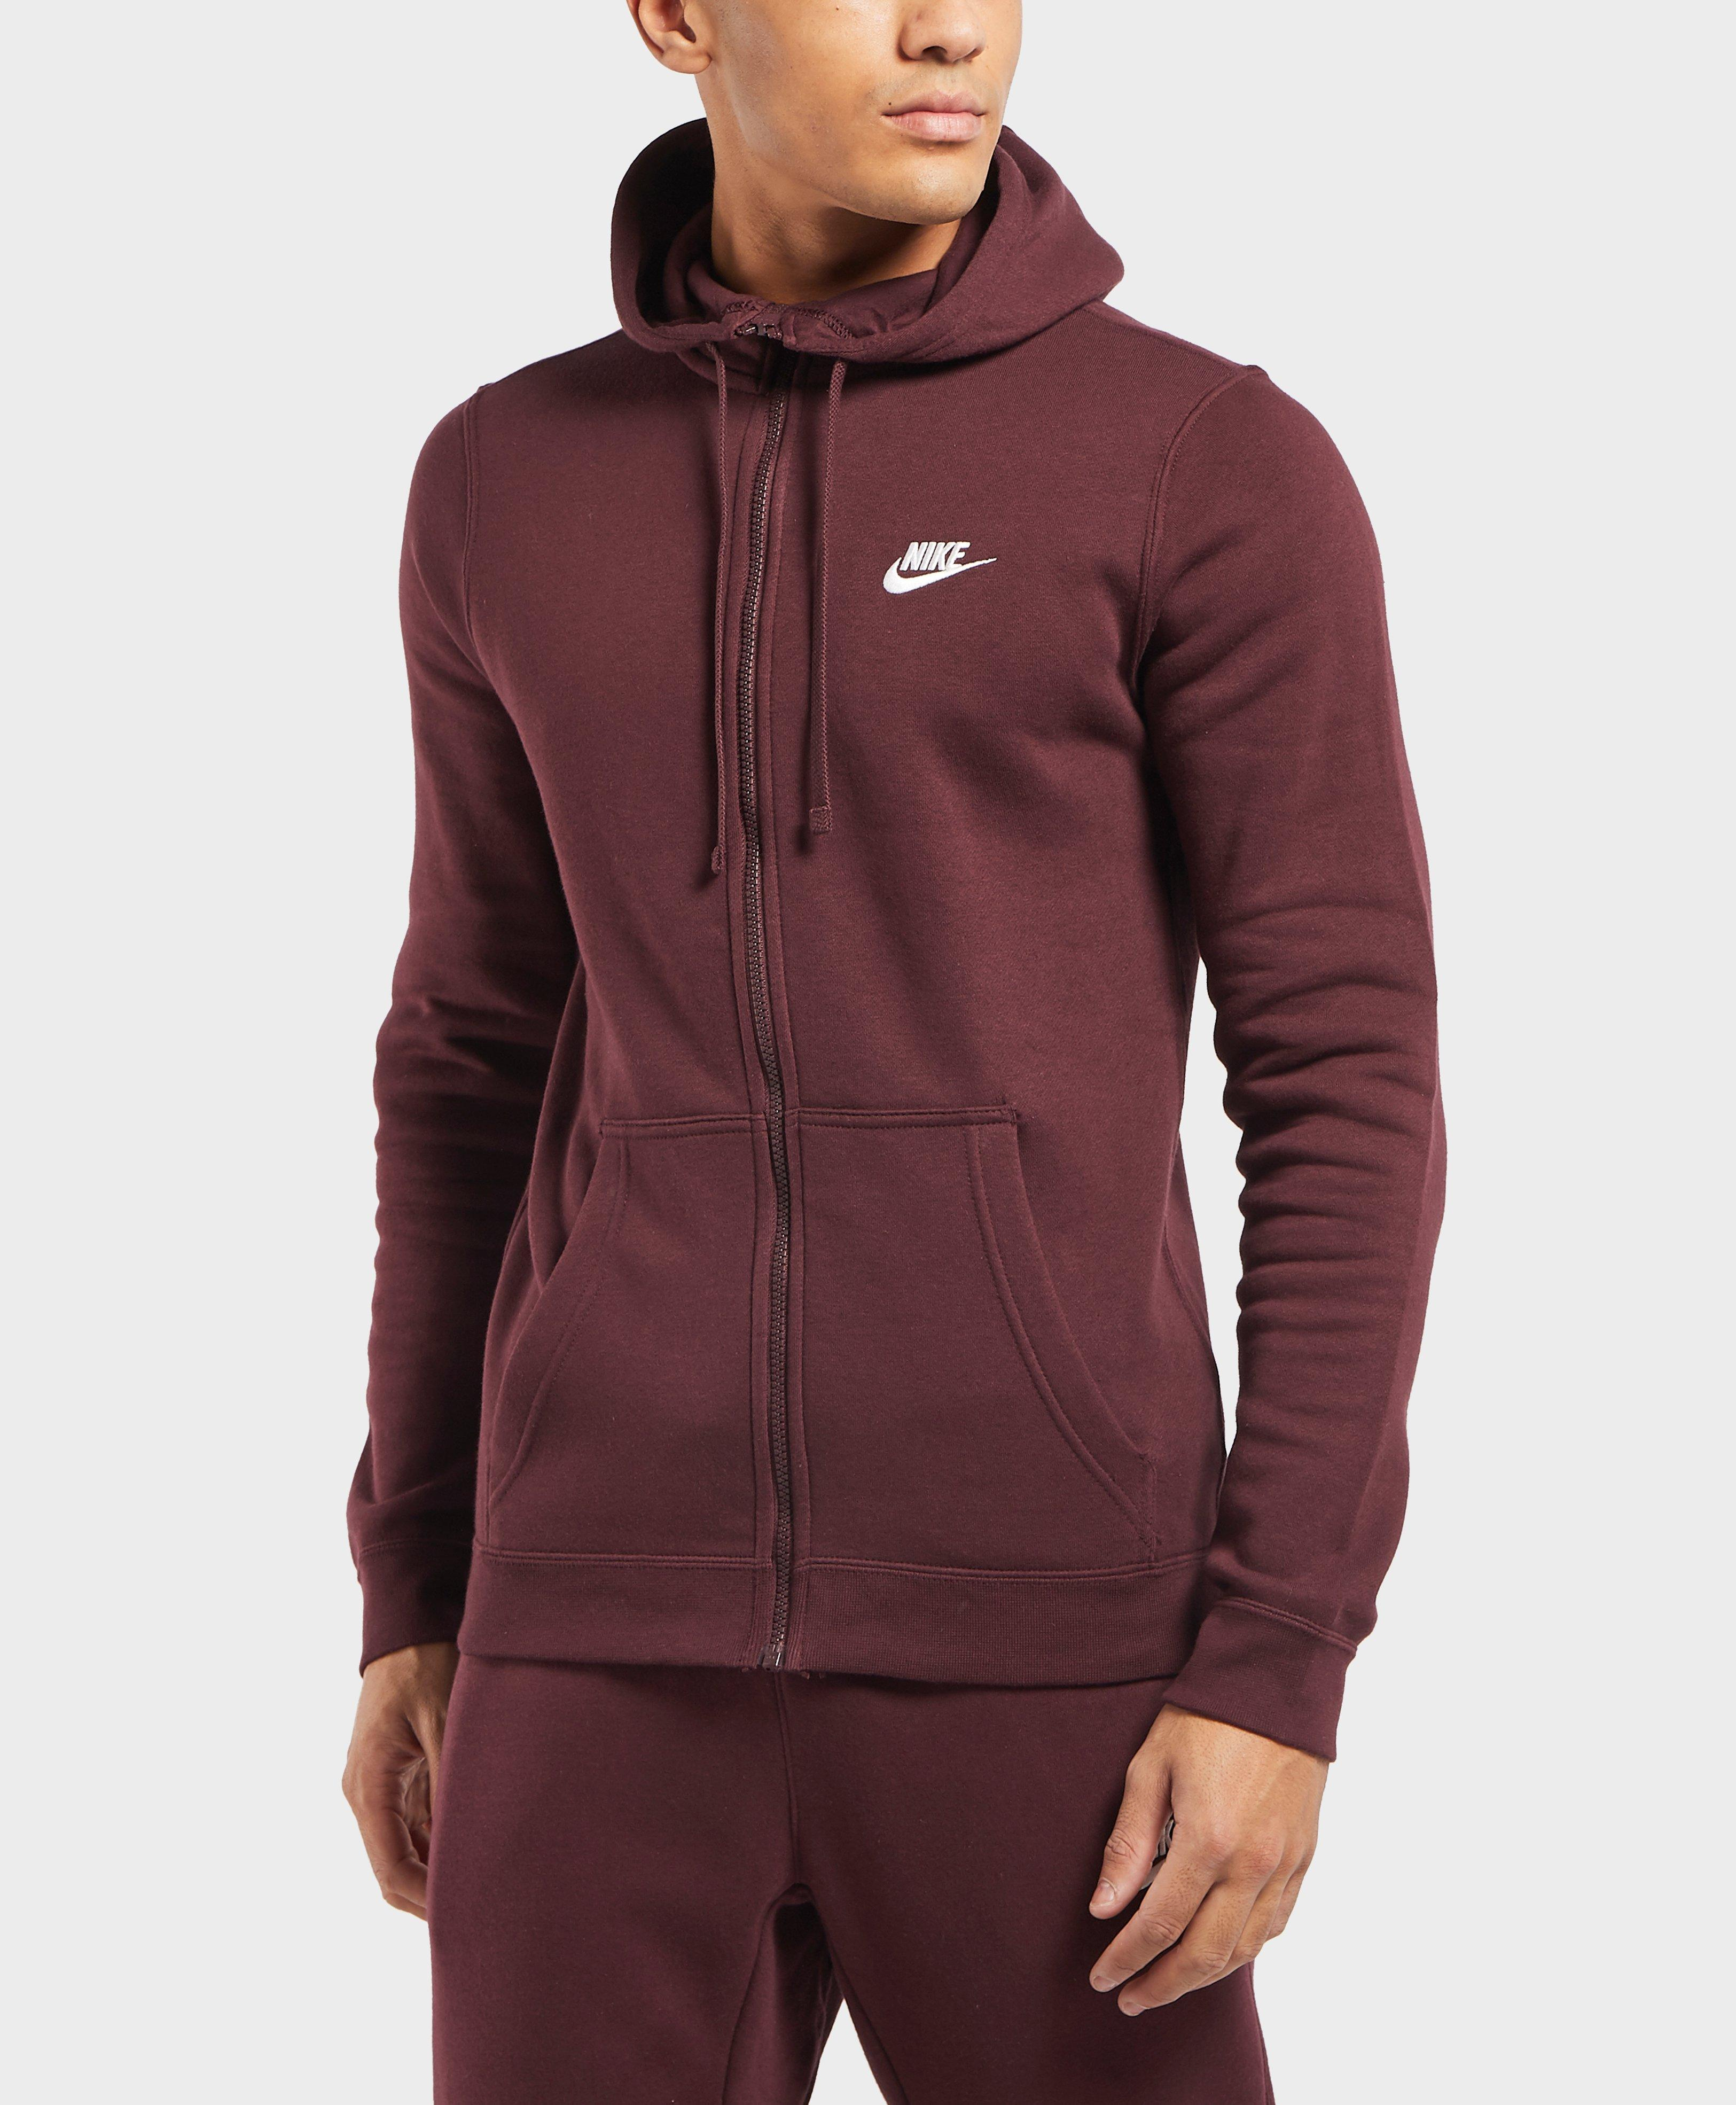 e933a5654804 Nike Club Fleece Full Zip Hoodie in Red for Men - Lyst